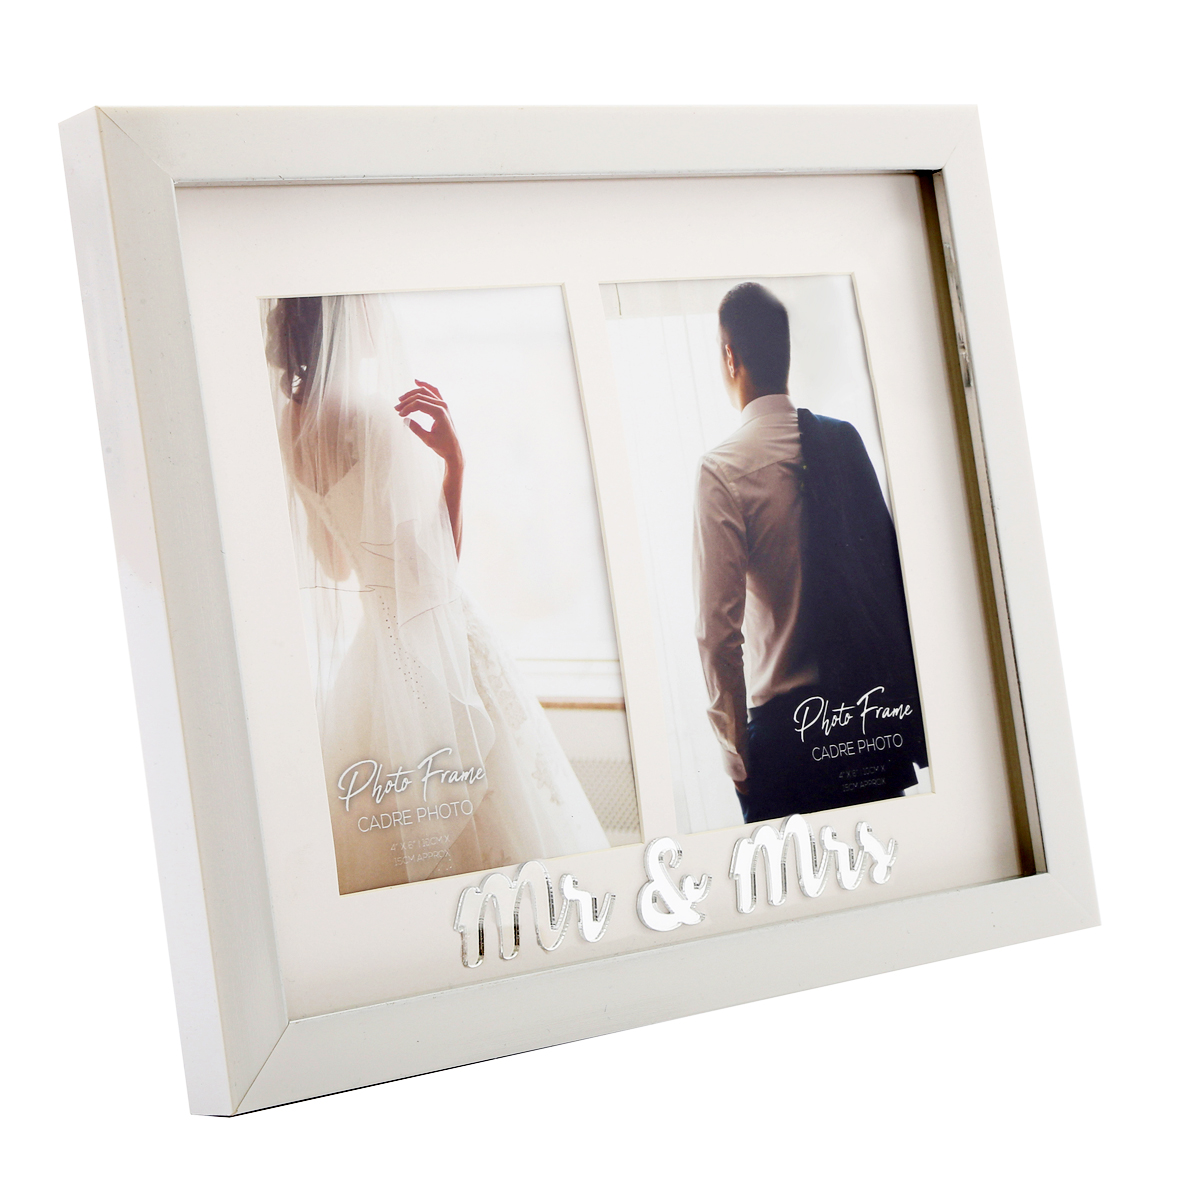 Cadre photo duo bois \'Mr & Mrs\' blanc (2 photos ) - 28x22 cm (2 photos 10x15 cm) - [A2921]